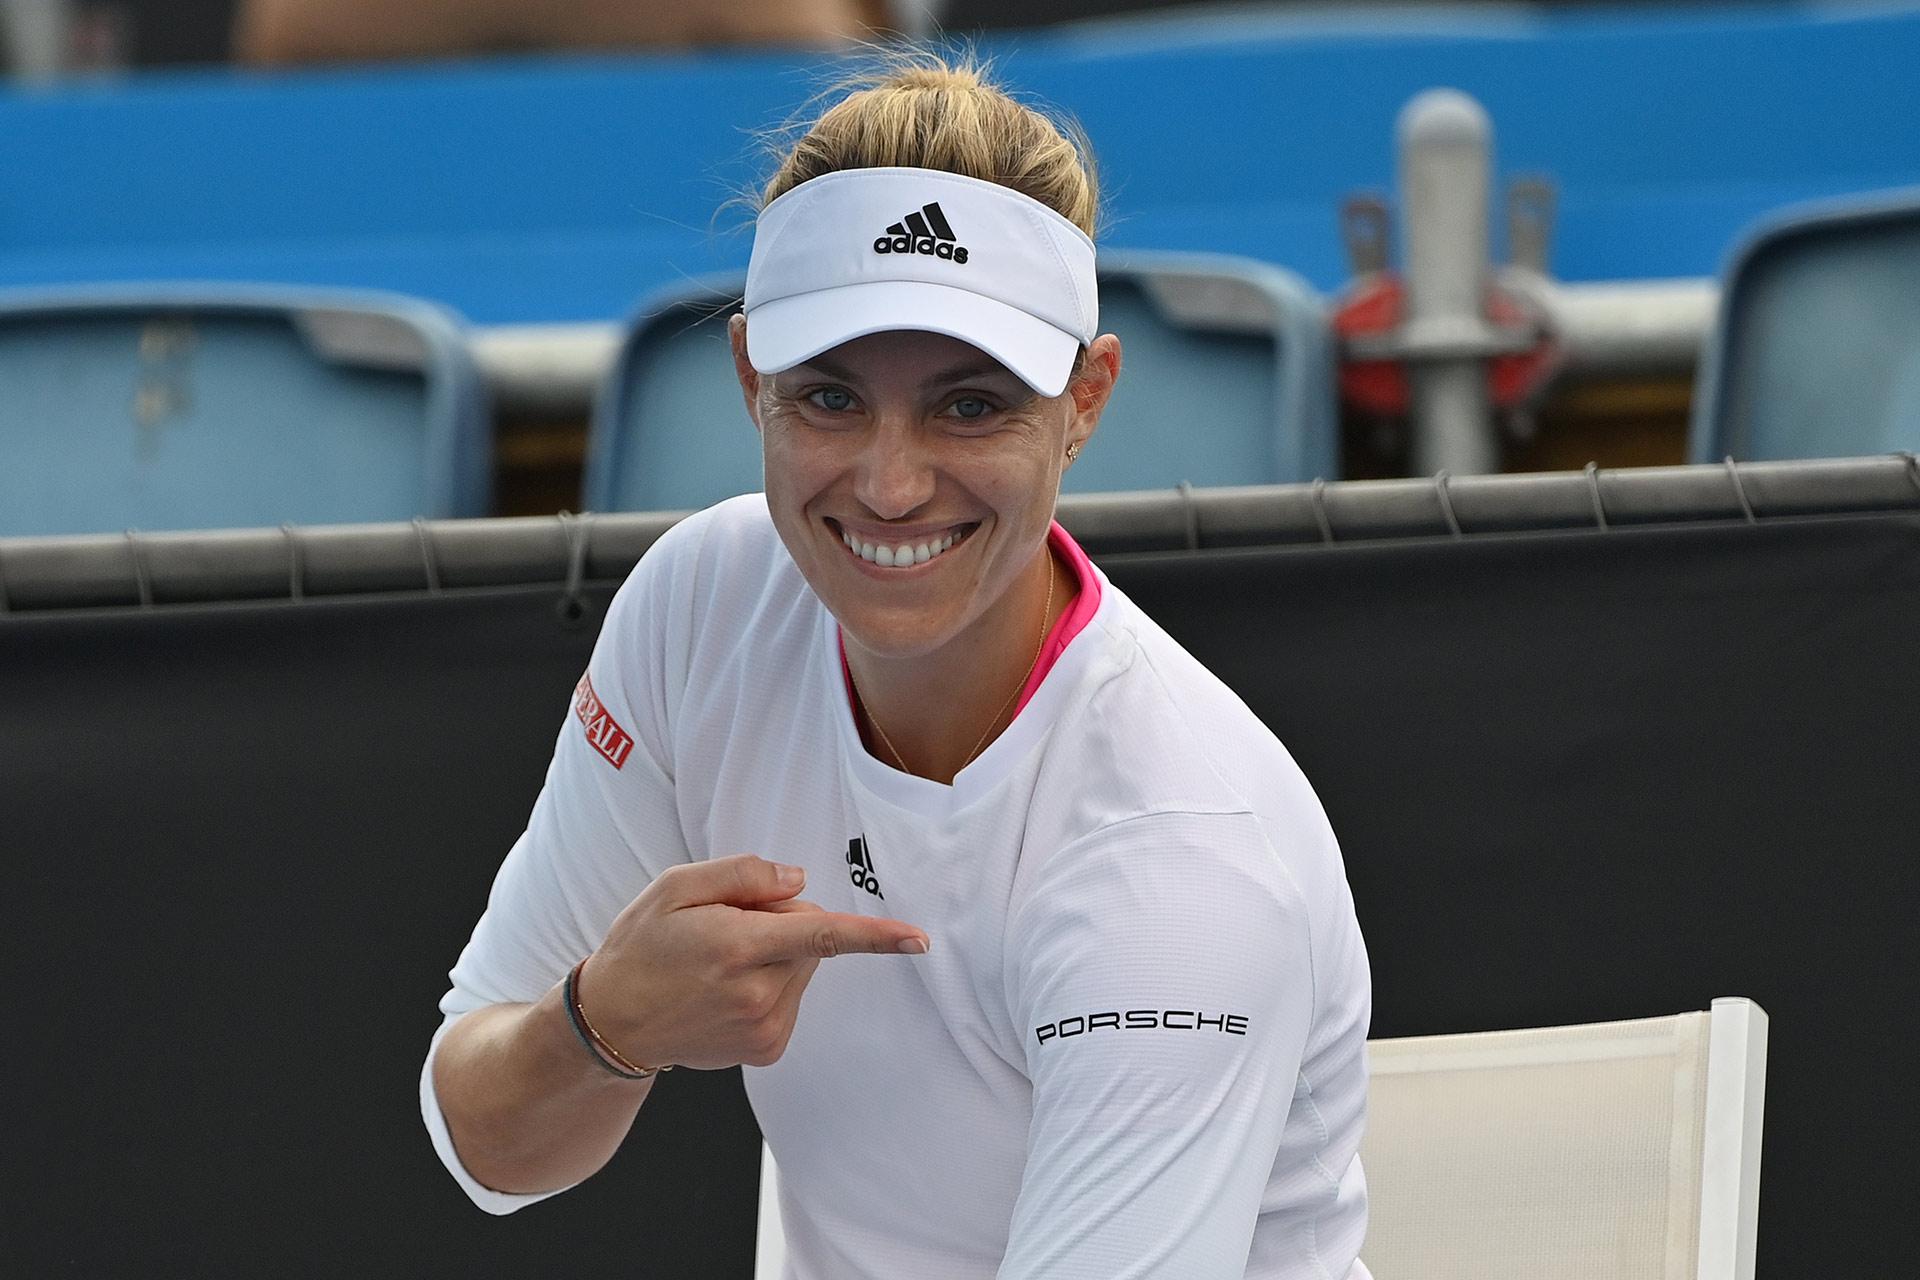 Interview mit Porsche-Markenbotschafterin Angelique Kerber vor den Australian Open